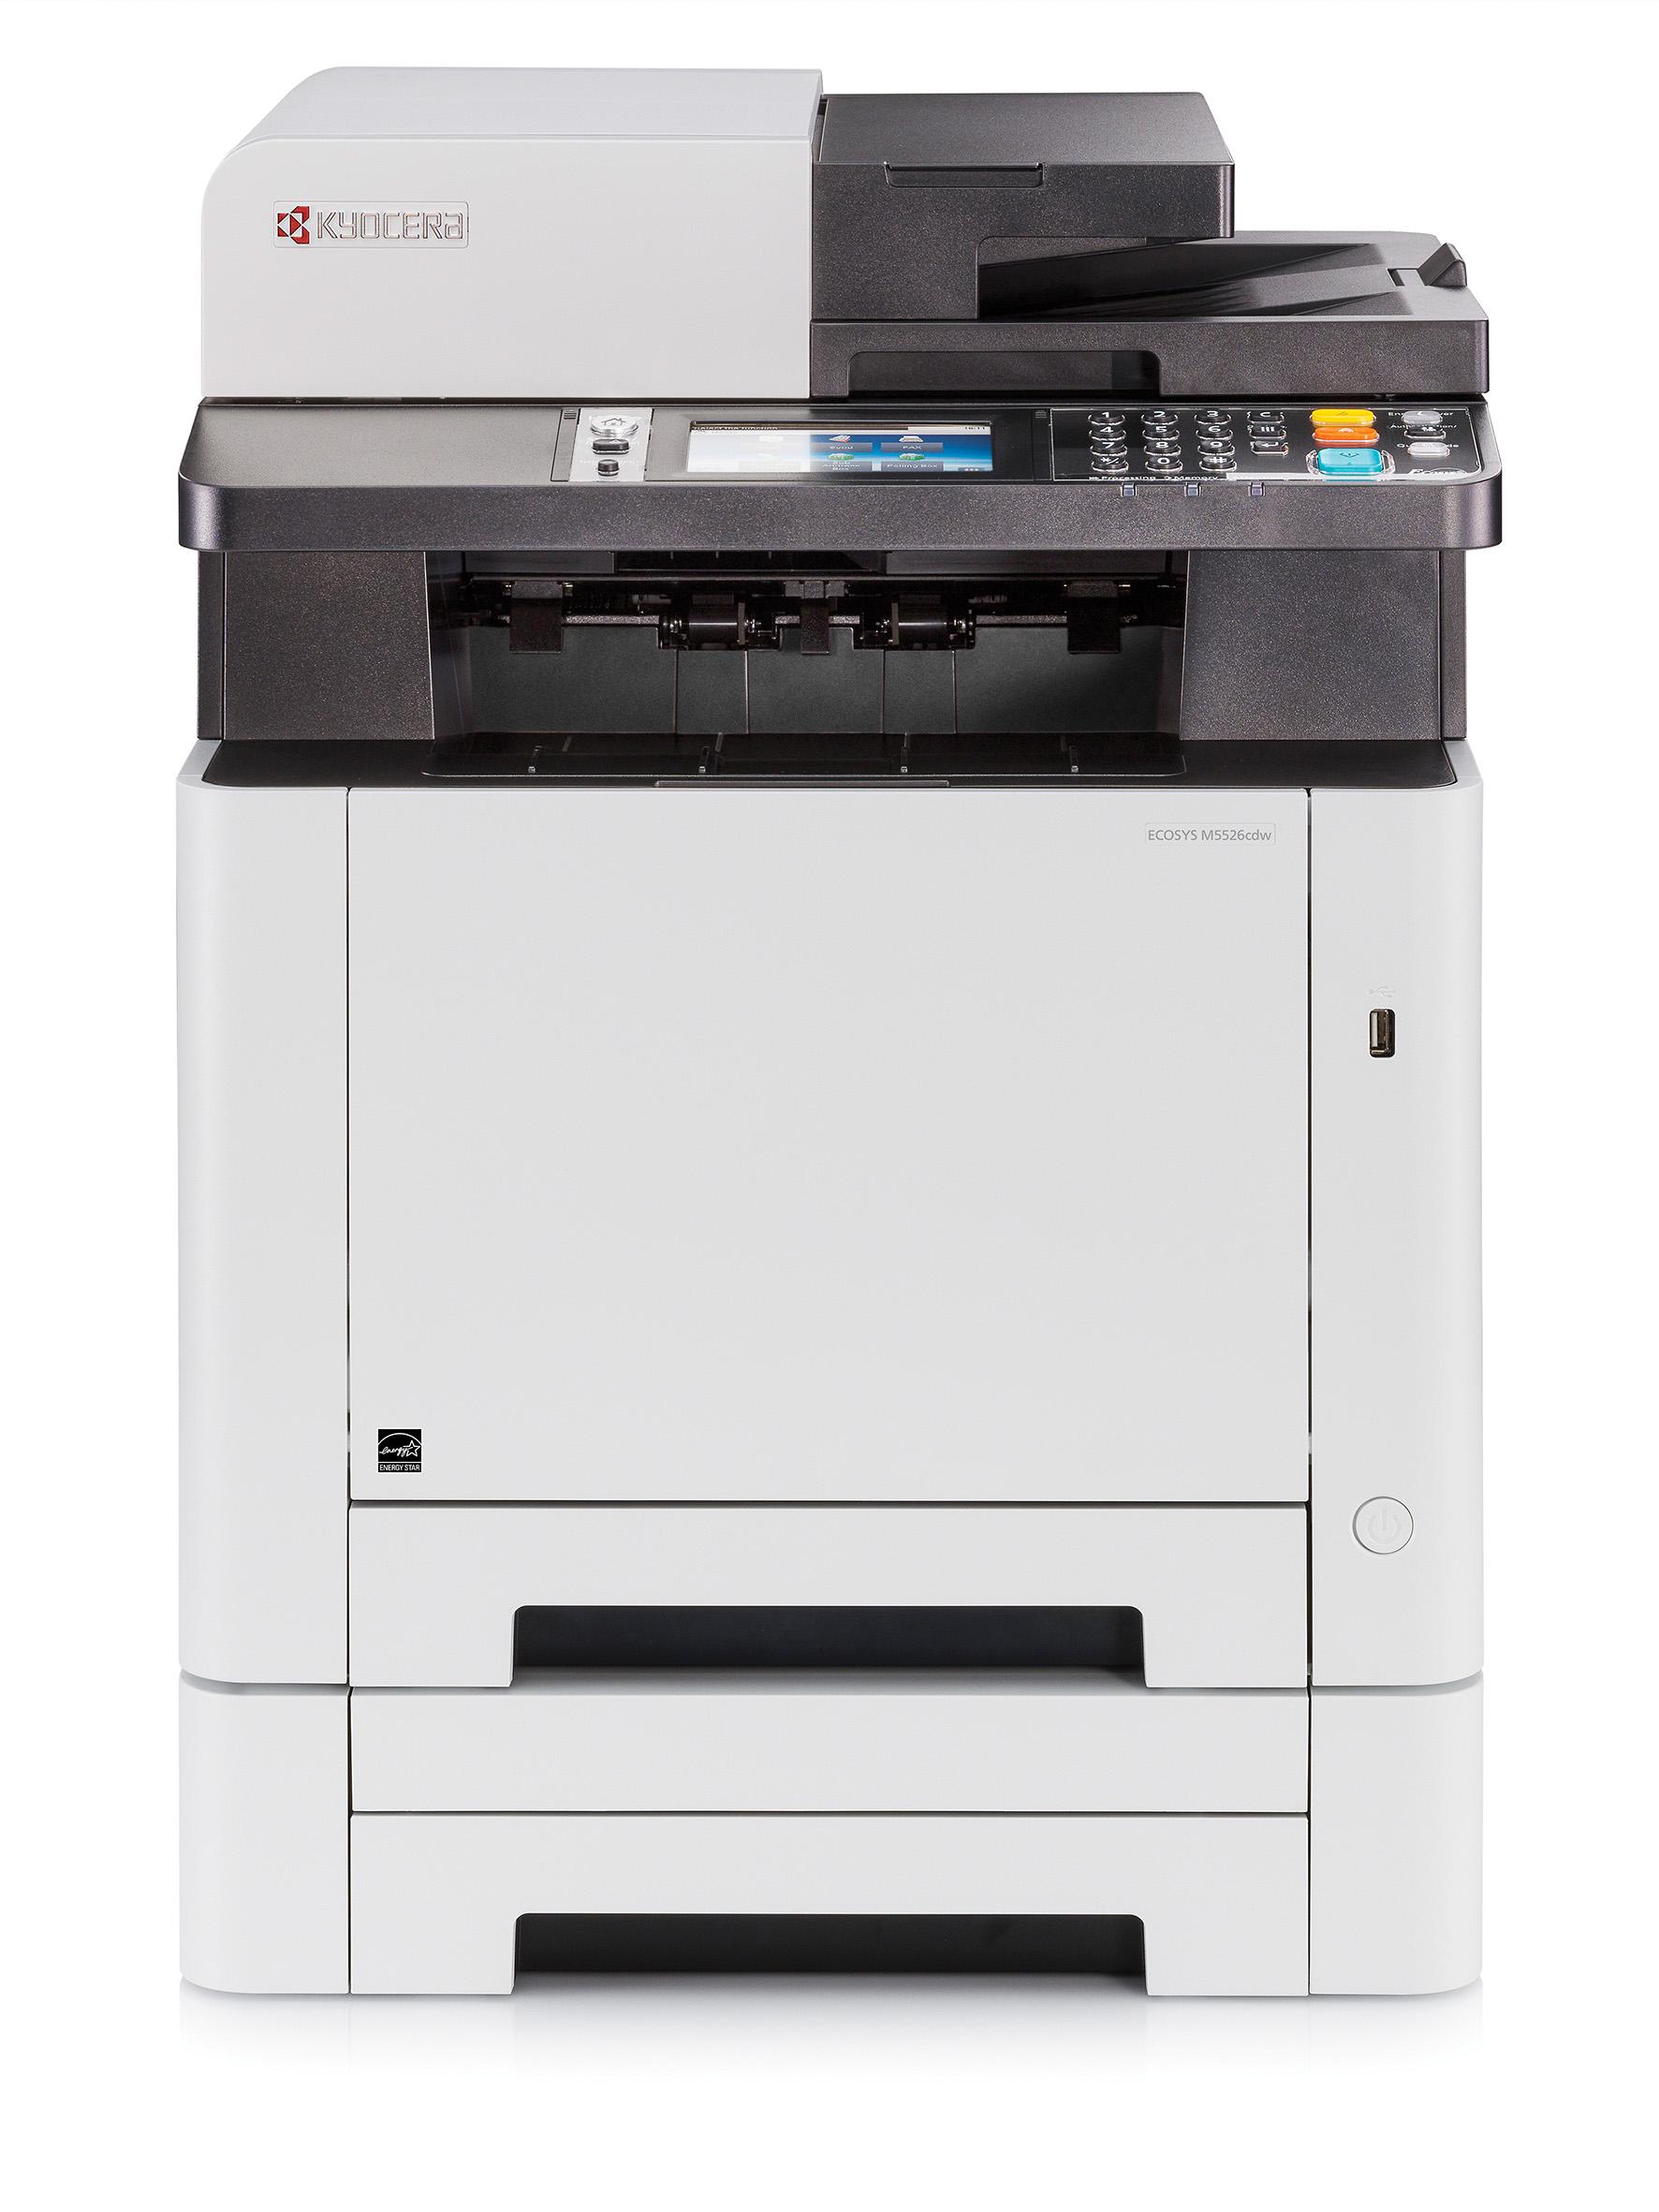 https://www.rhymebiz.com/sites/rhymebiz.com/assets/images/Kyocera-Printers/Kyocera-ECOSYS_M5526cdw.jpg